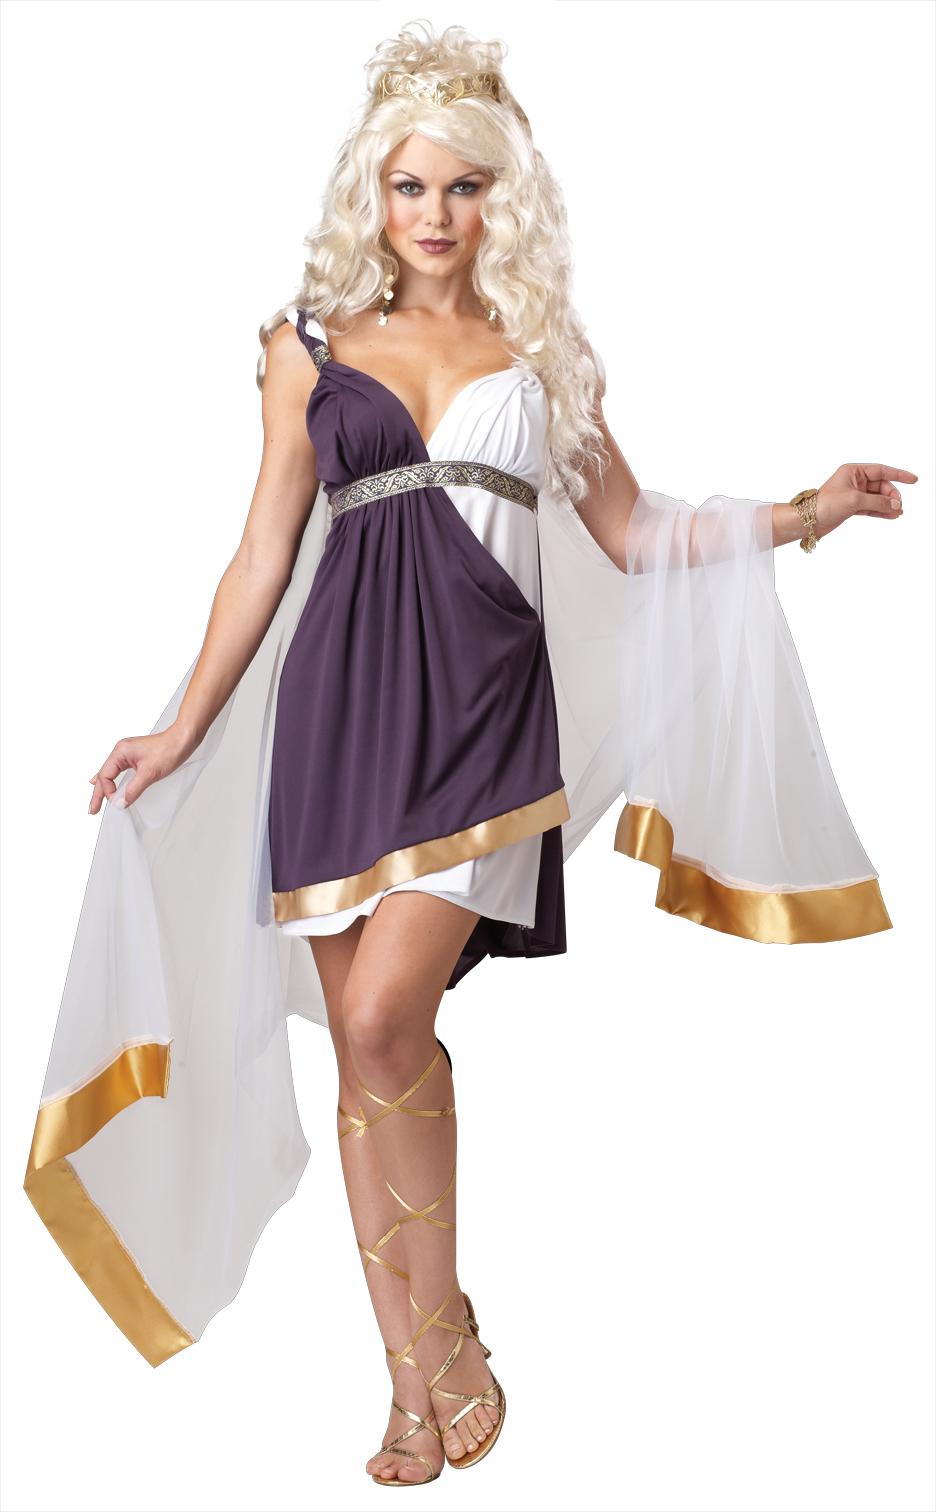 v nus d esse de l 39 amour femme grecque grec romain toge costume robe fantaisie 6 14 ebay. Black Bedroom Furniture Sets. Home Design Ideas